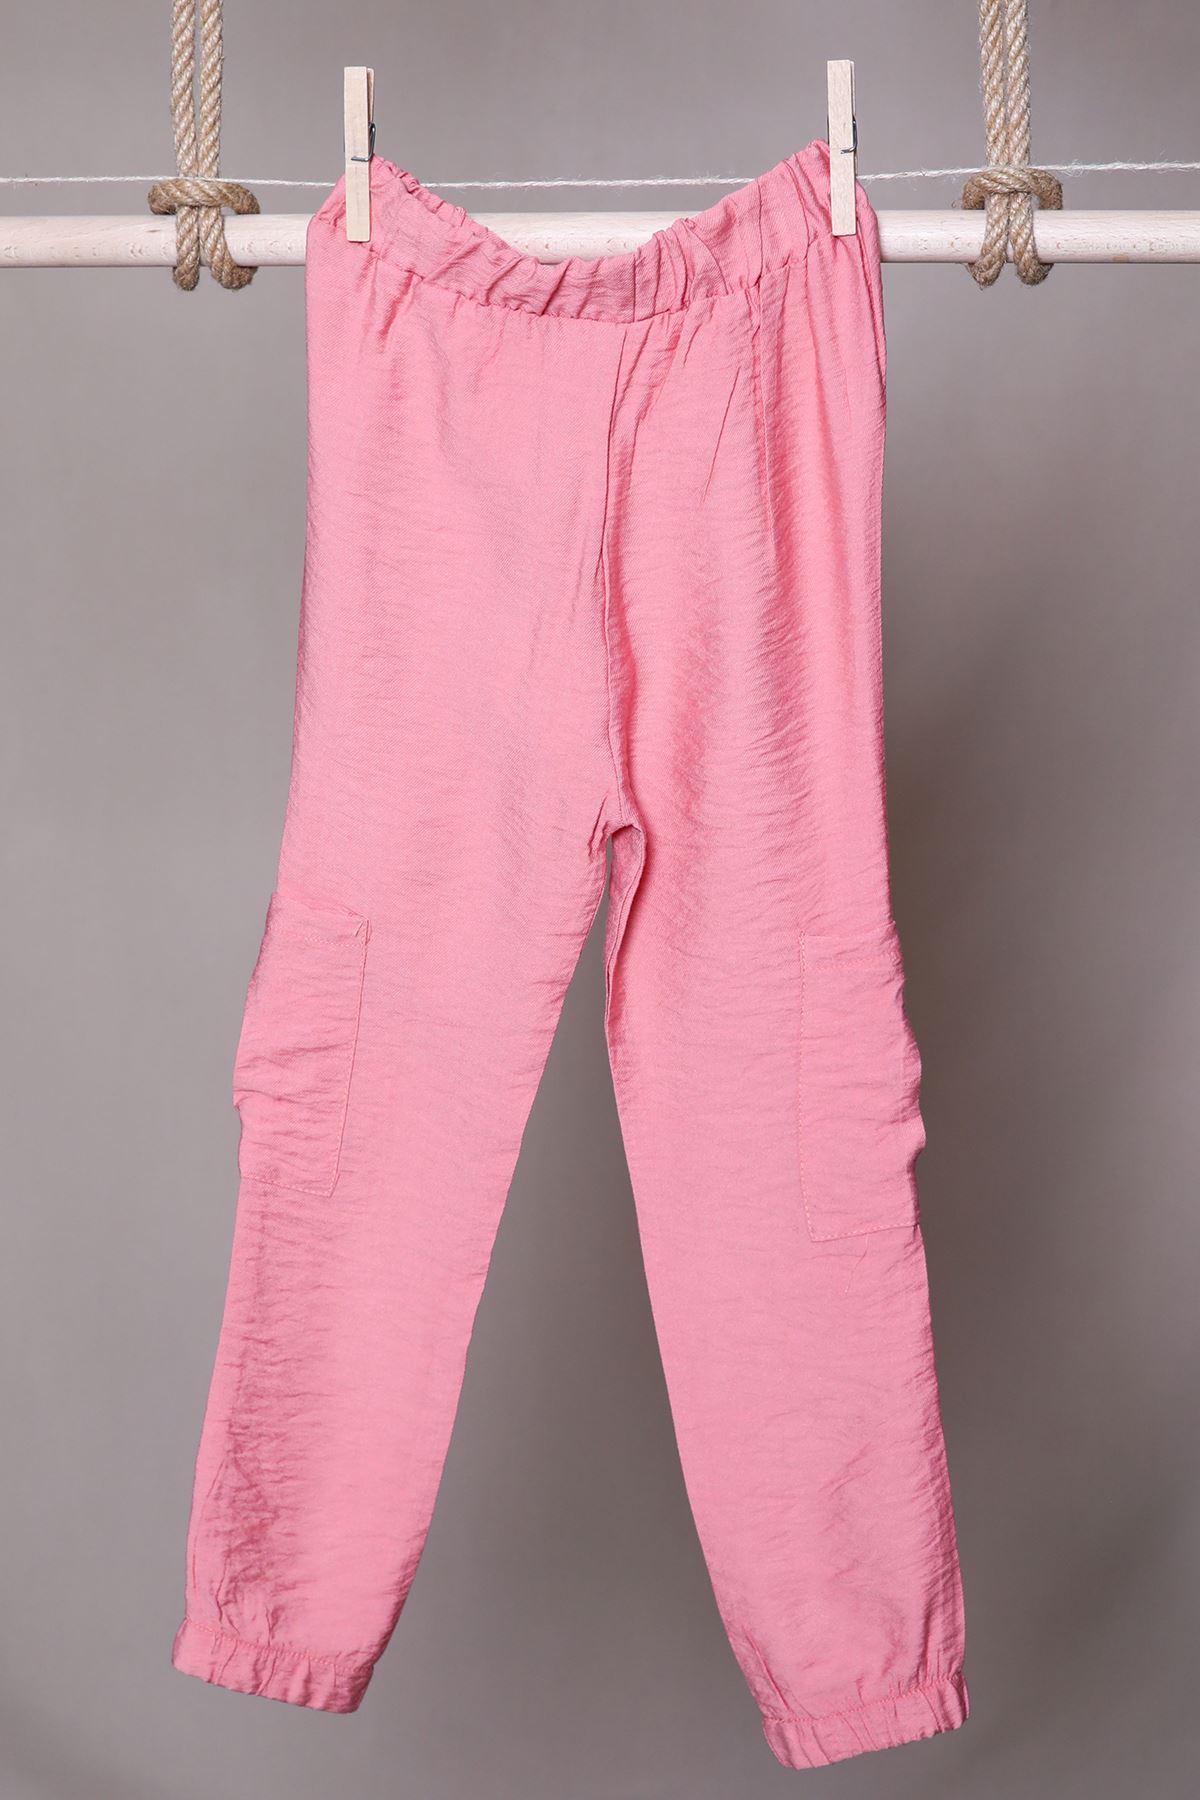 Lastik Paçalı Keten Çocuk Pantalon